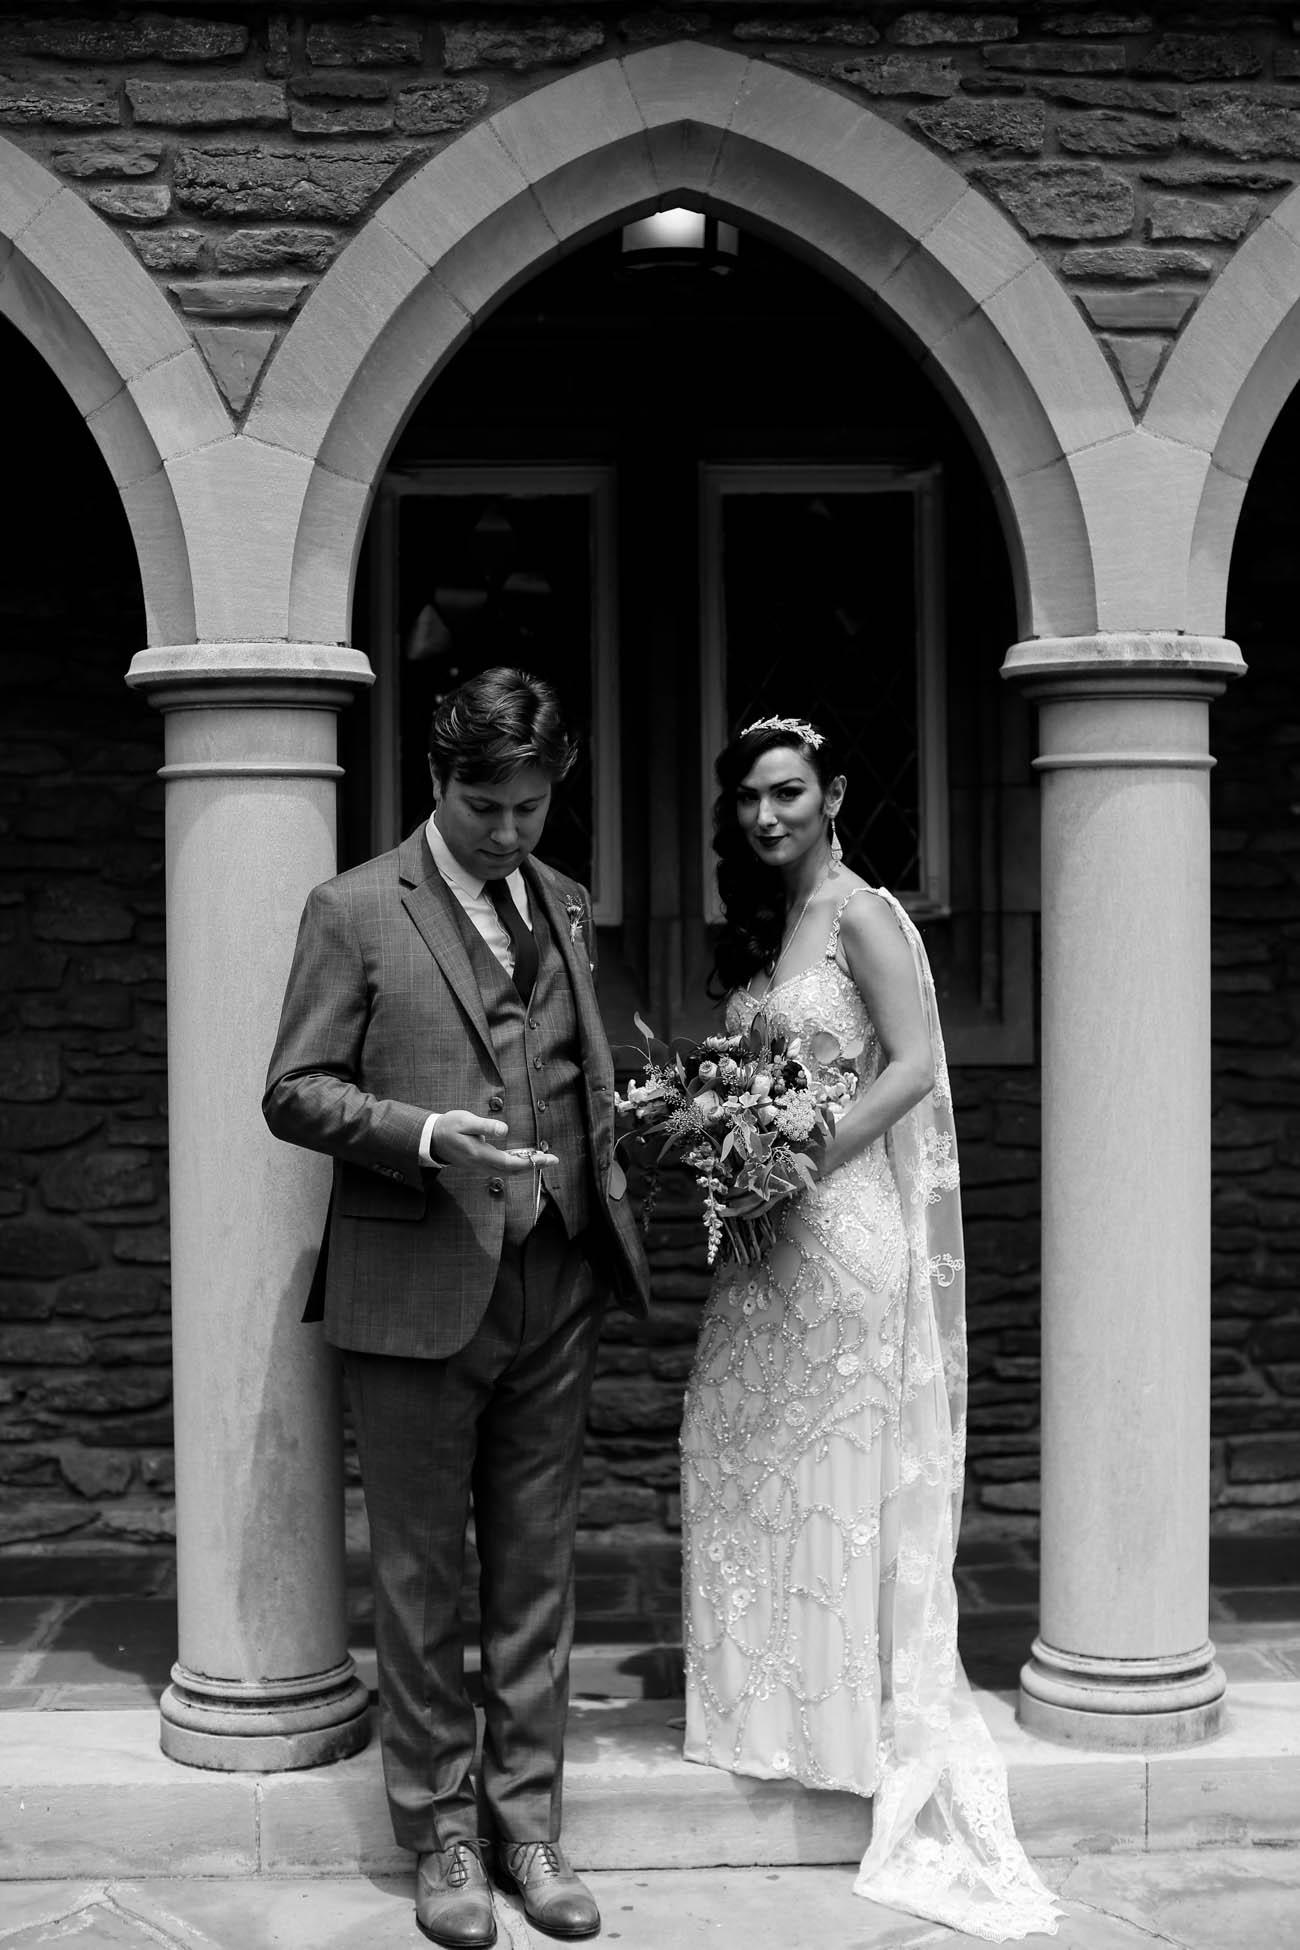 Speakeasy-1920s-theme-Louisville-and-Lexington Wedding-53.jpg